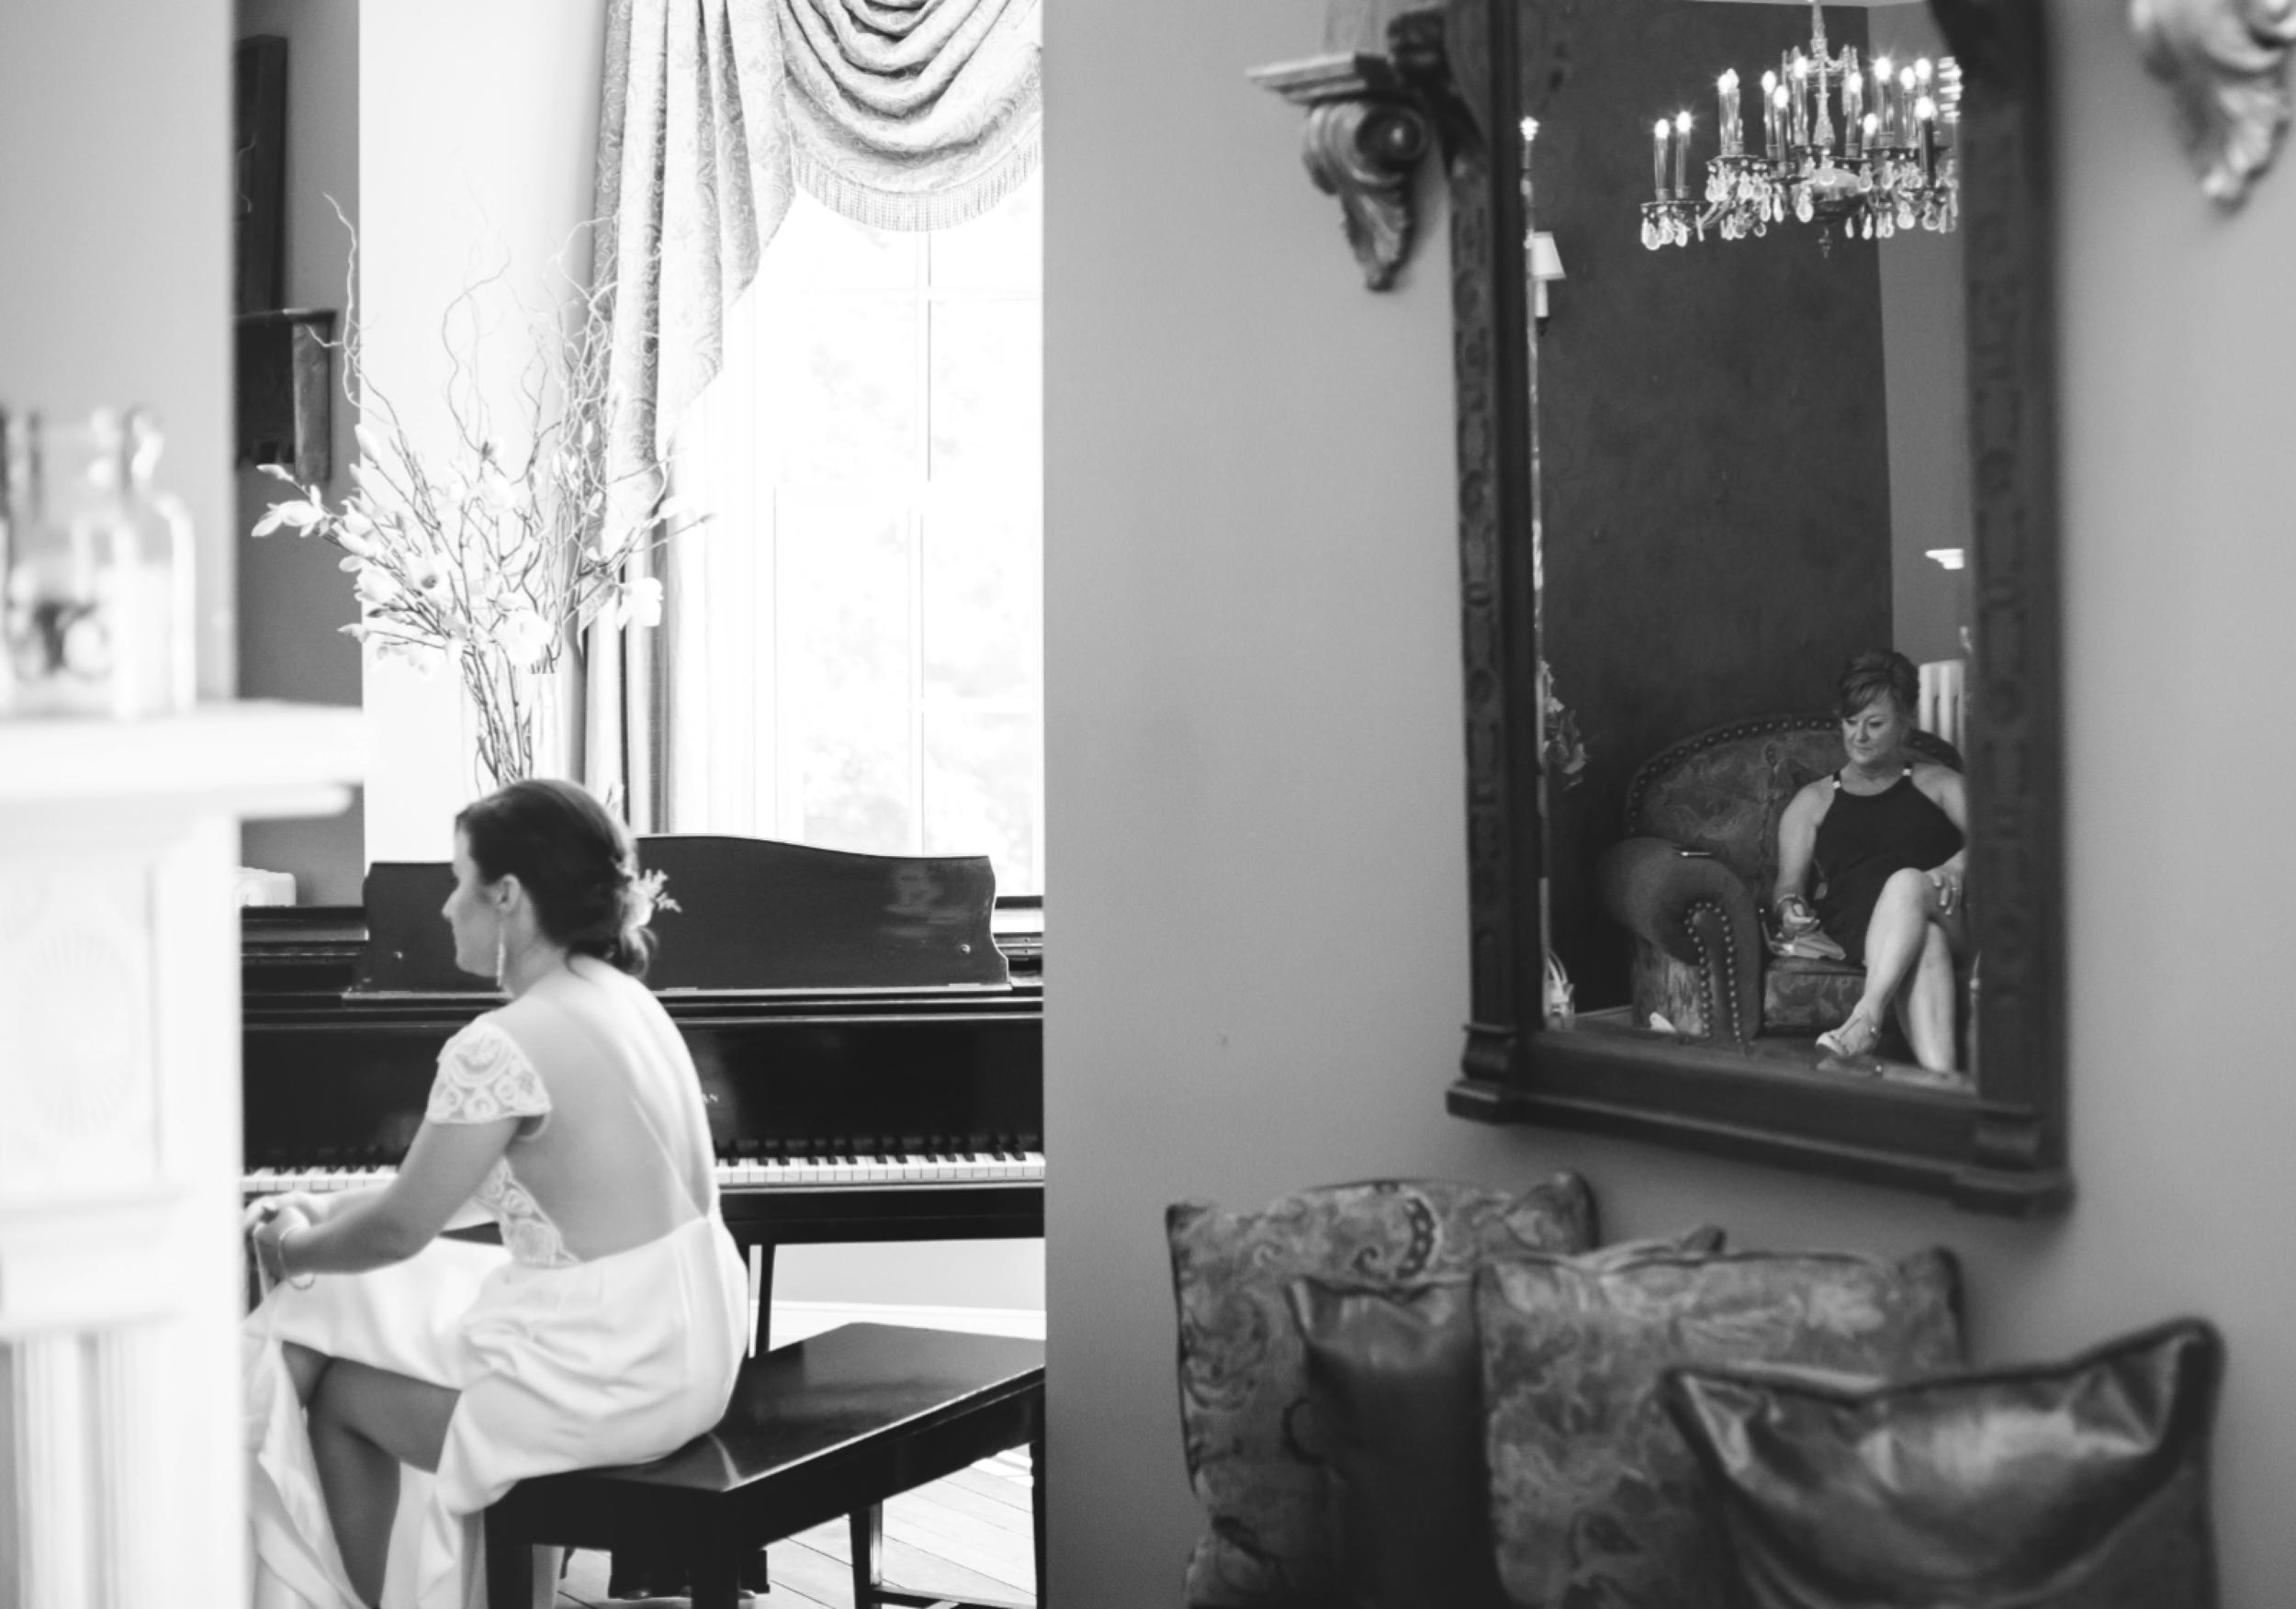 Wedding-Kurtz-Orchard-Market-Niagara-On-The-Lake-Toronto-Hamilton-Burlington-Oakville-Niagara-Wedding-Photographer-Photography-Moments-by-Lauren-Photo-Image-14.png